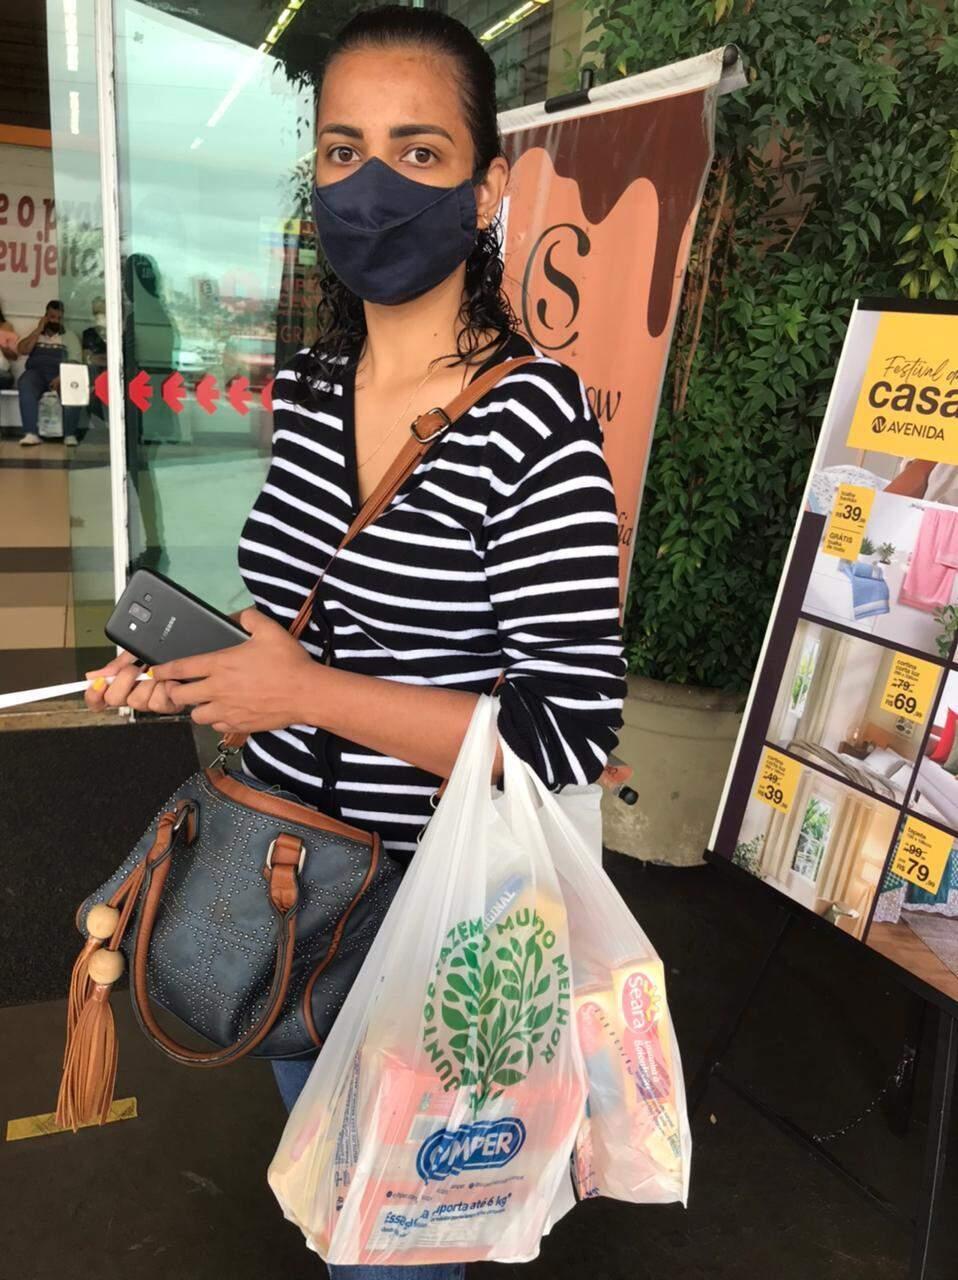 Isabella gastou R$ 38,00 em lasanha, bolachas e leite. (Foto: Bruna Marques)